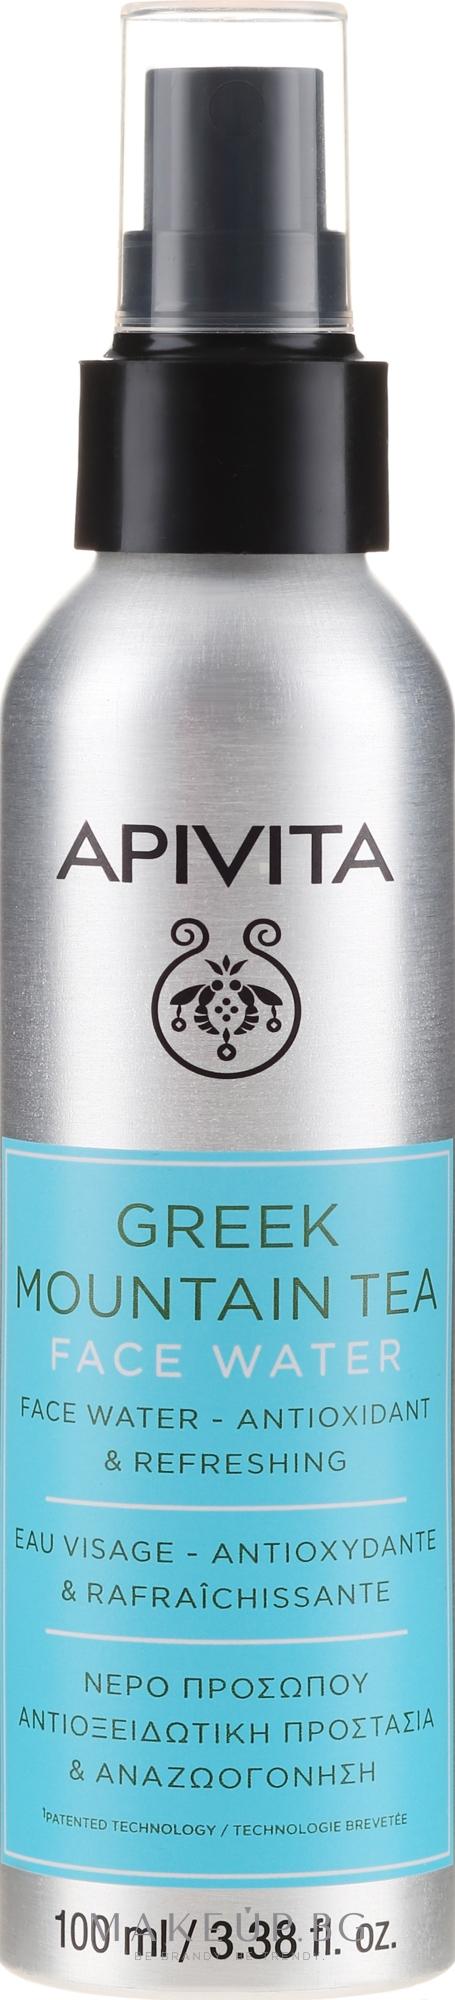 Антиоксидантна и освежаваща вода за лице с горски чай - Apivita Greek Mountain Tea Face Water — снимка 100 ml